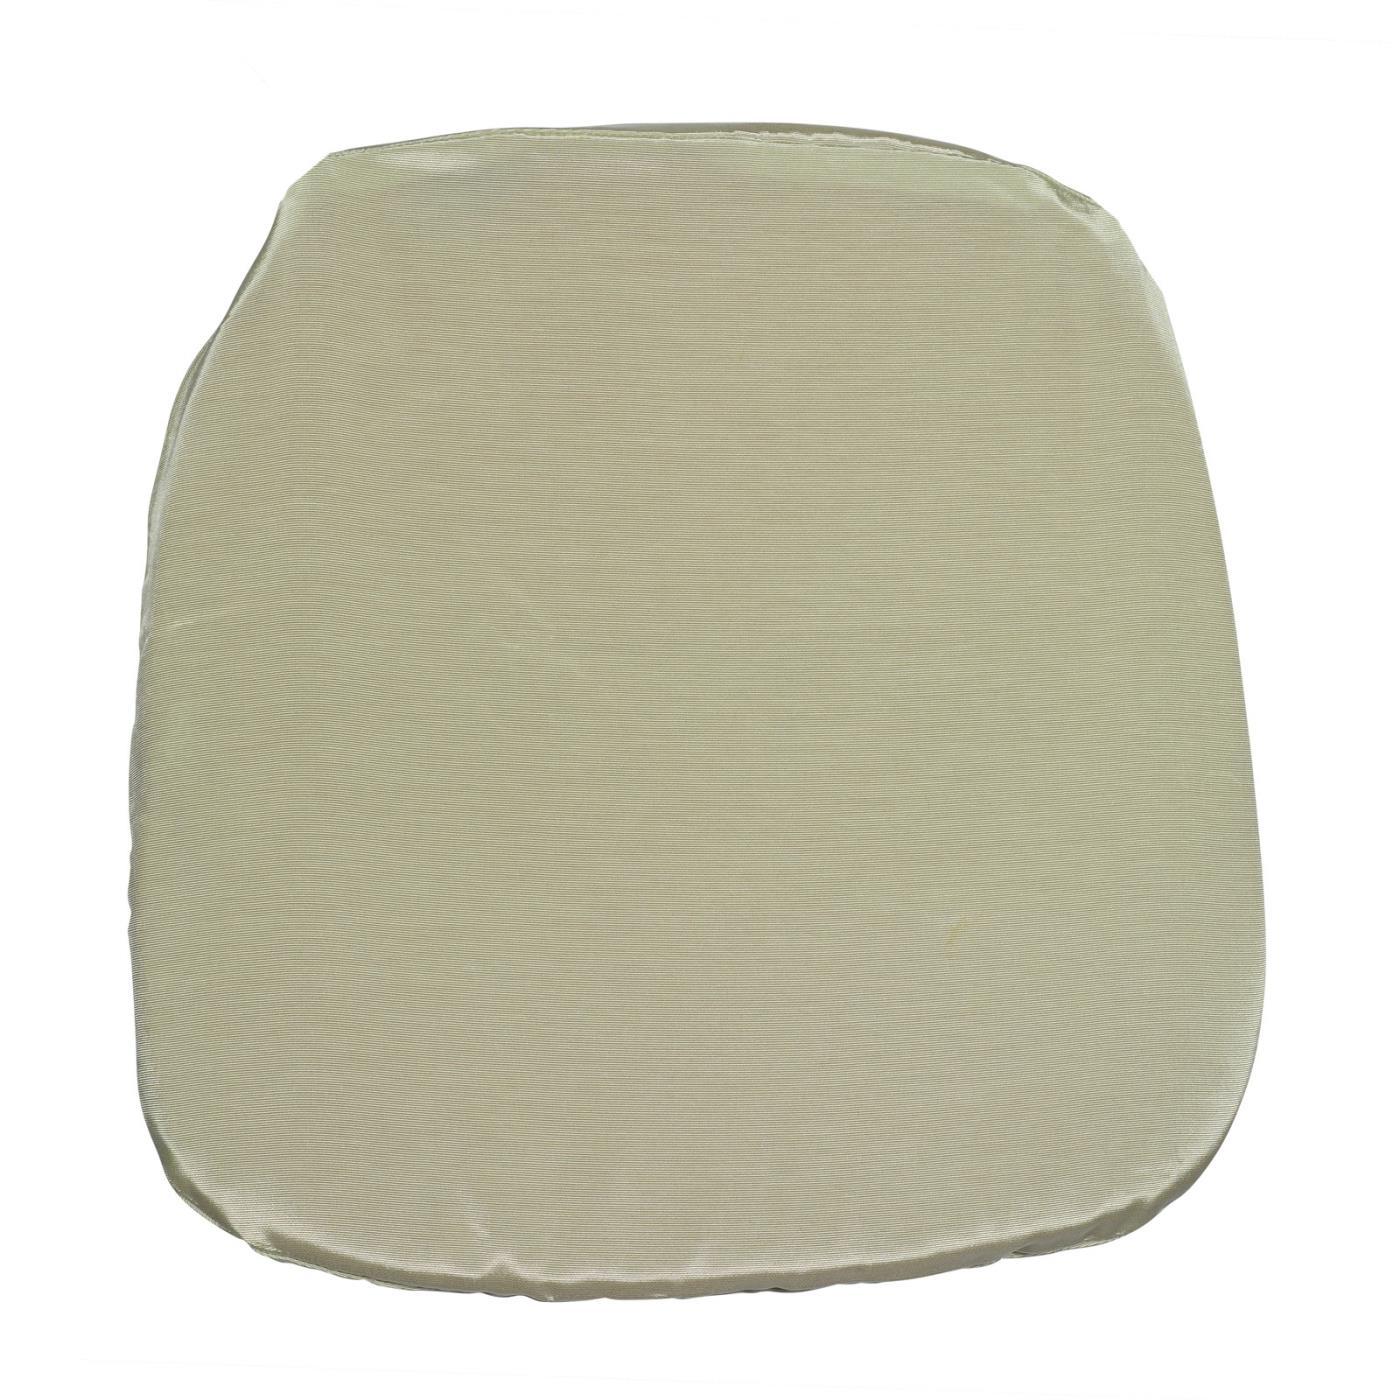 Bengaline Seat Cushion - Celedon